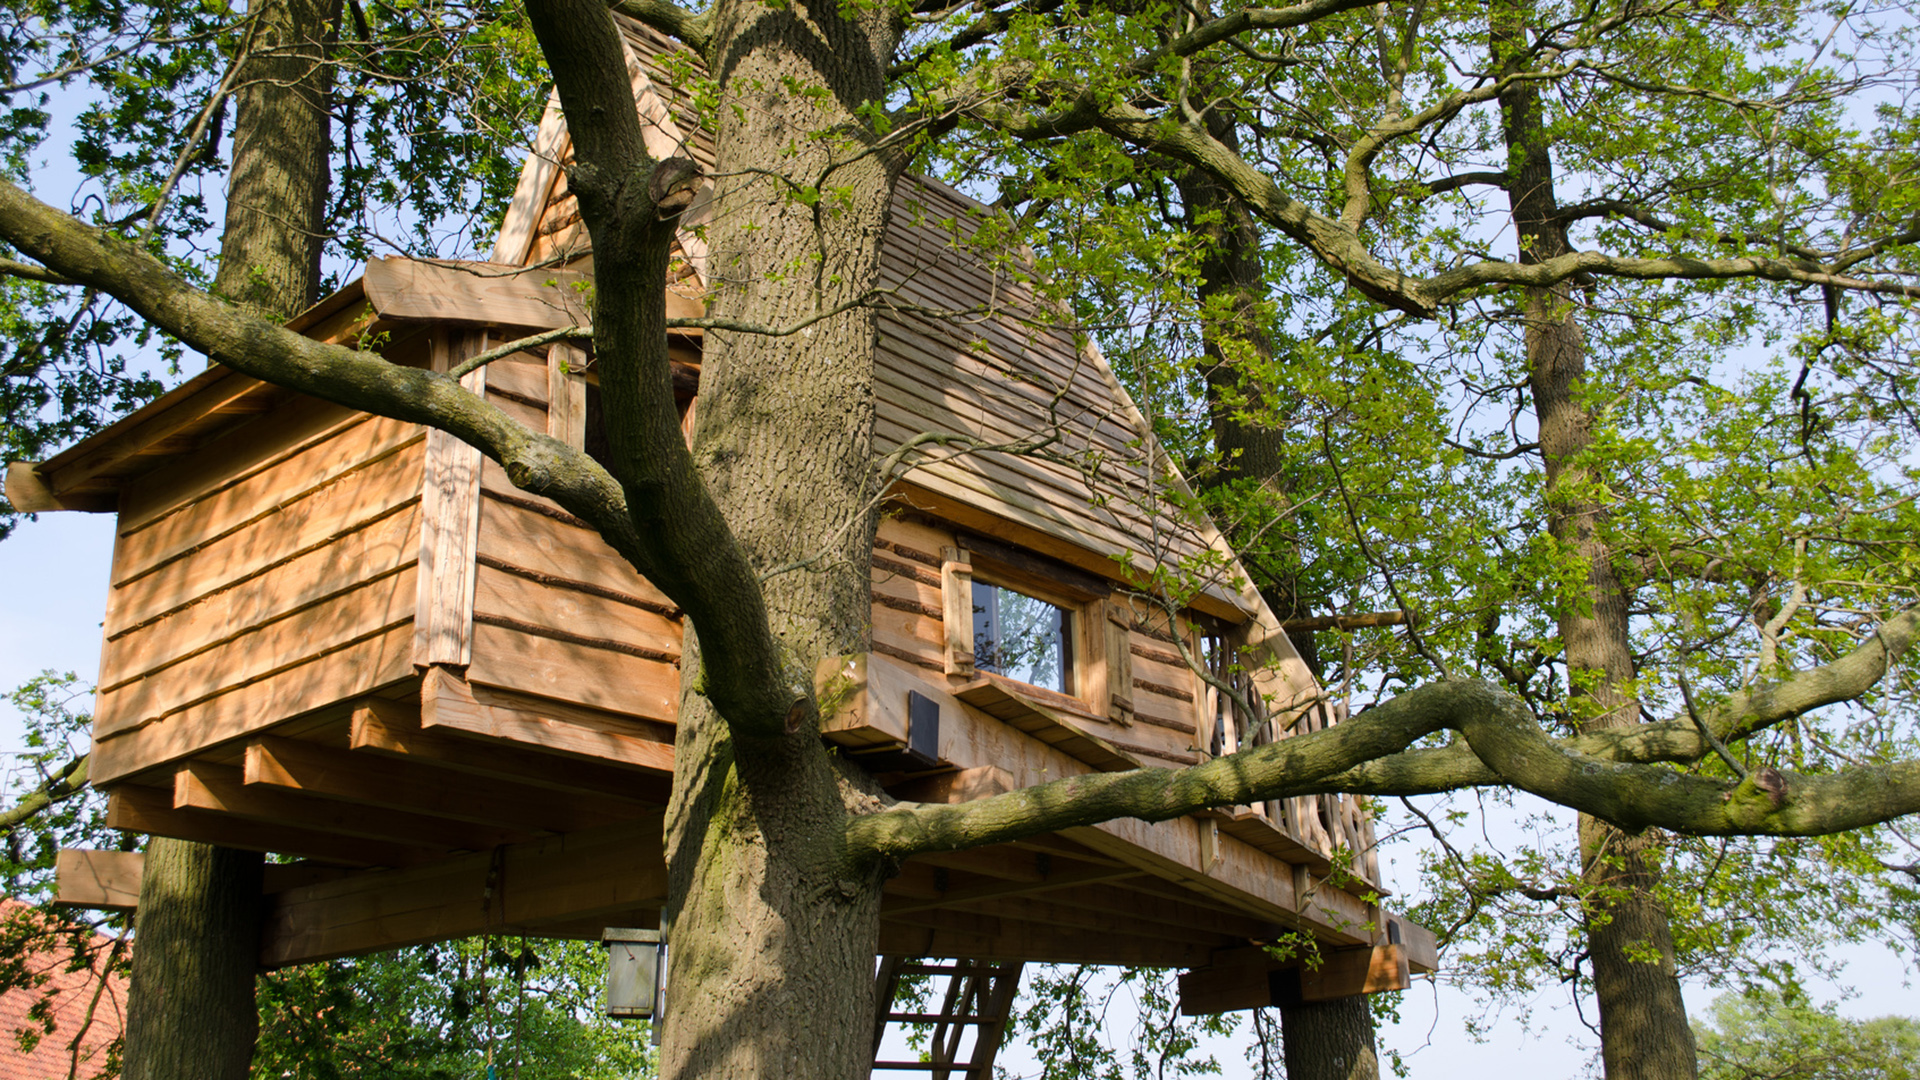 cabane r ves constructeur de cabane dans les arbres. Black Bedroom Furniture Sets. Home Design Ideas